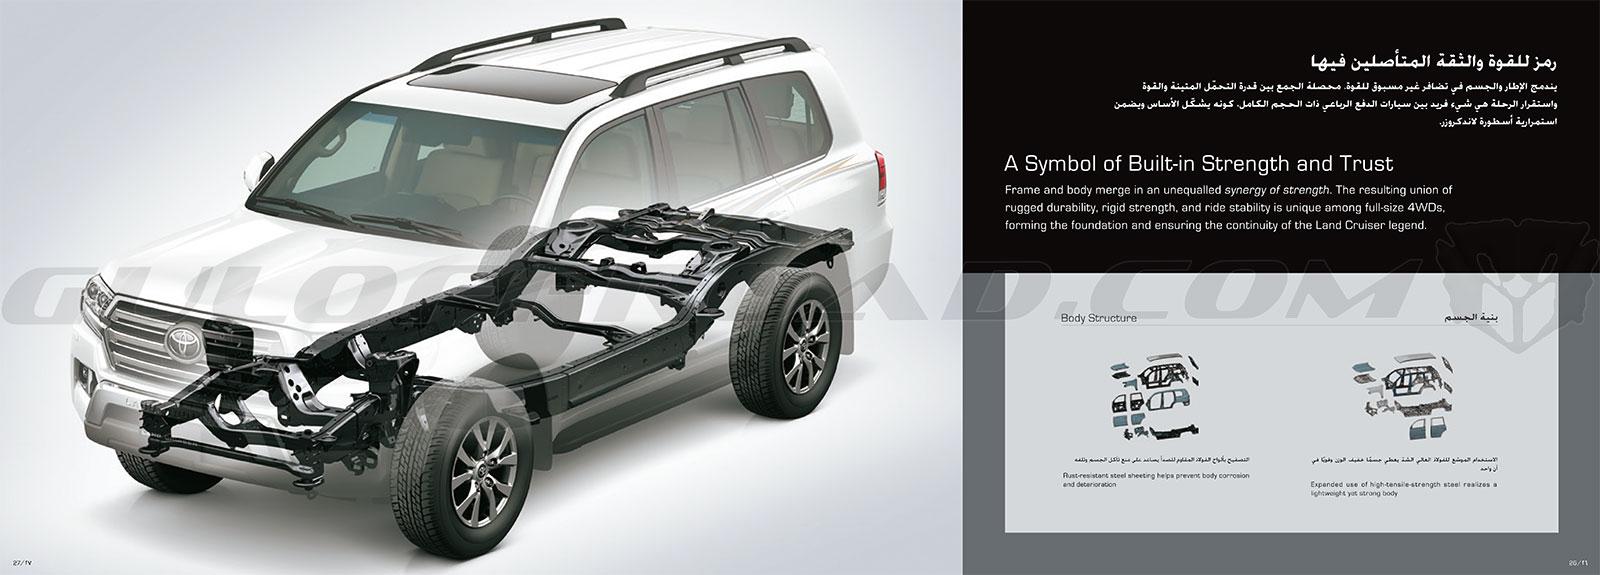 Chasis Toyota LandCruiser 200 Spain